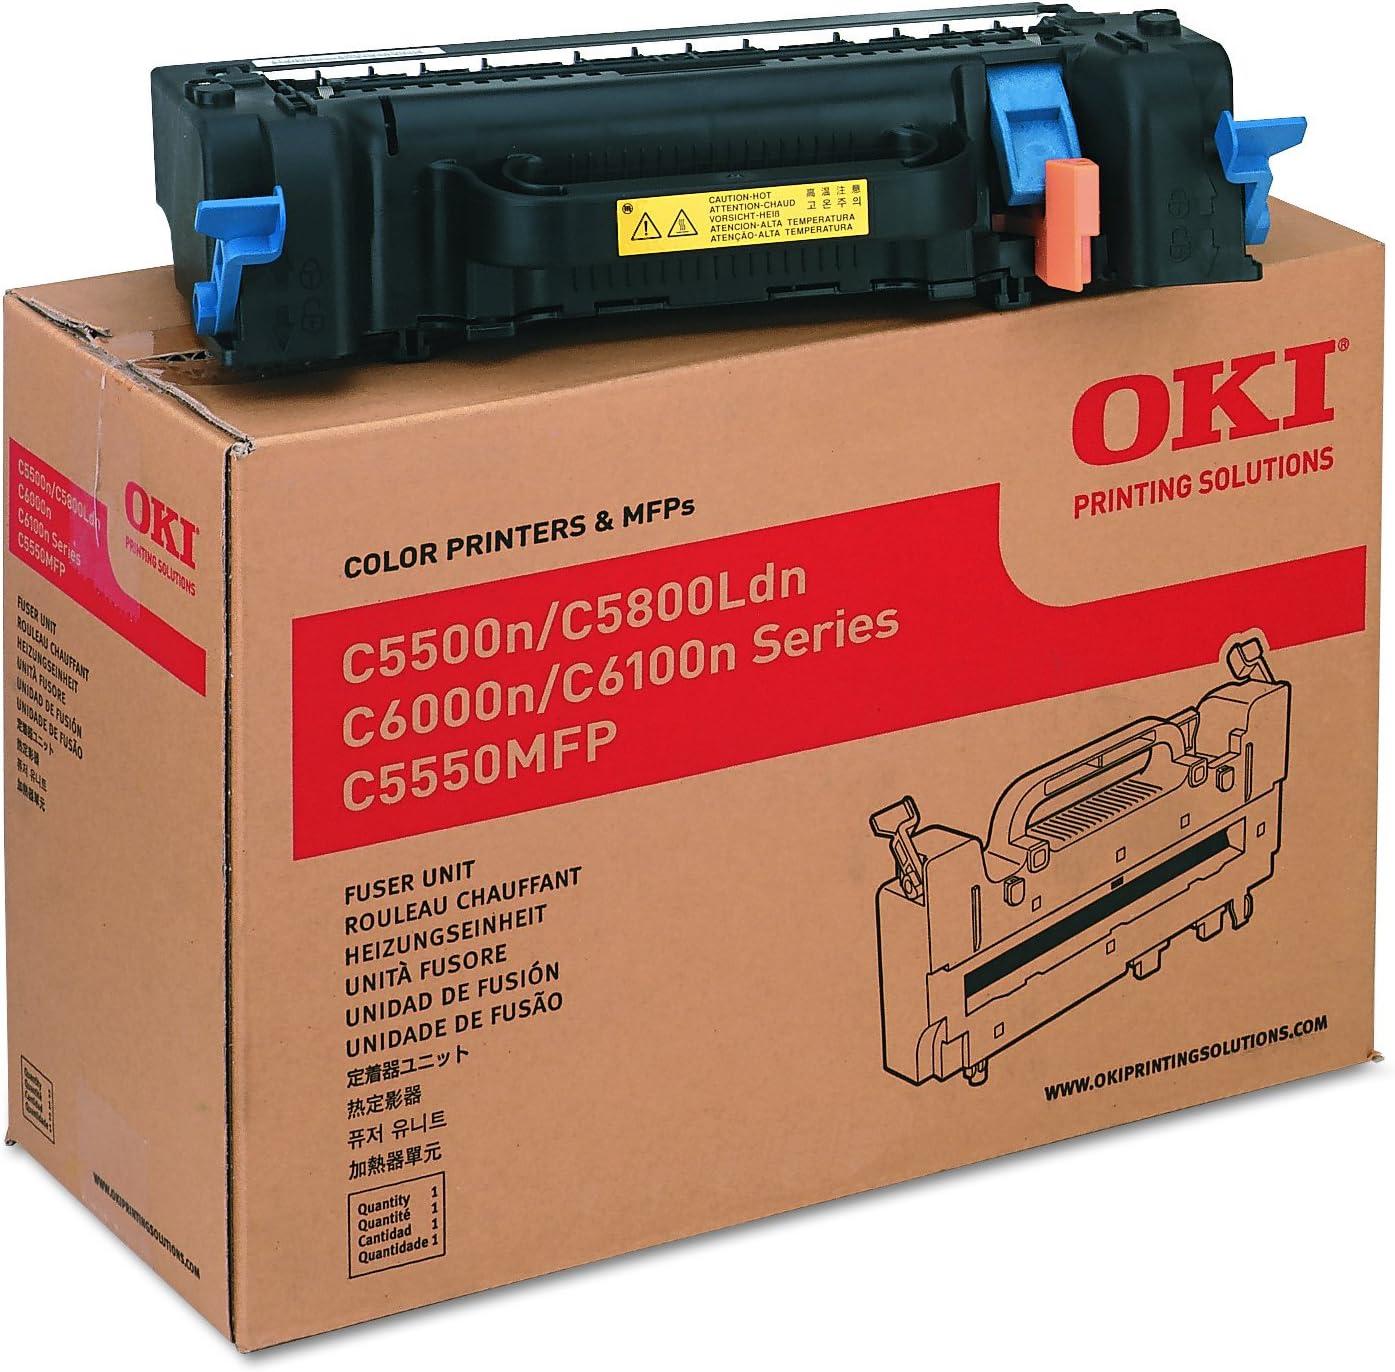 Amazon.com: OKI 43363201 C5500 Fuser Unit: Office Products